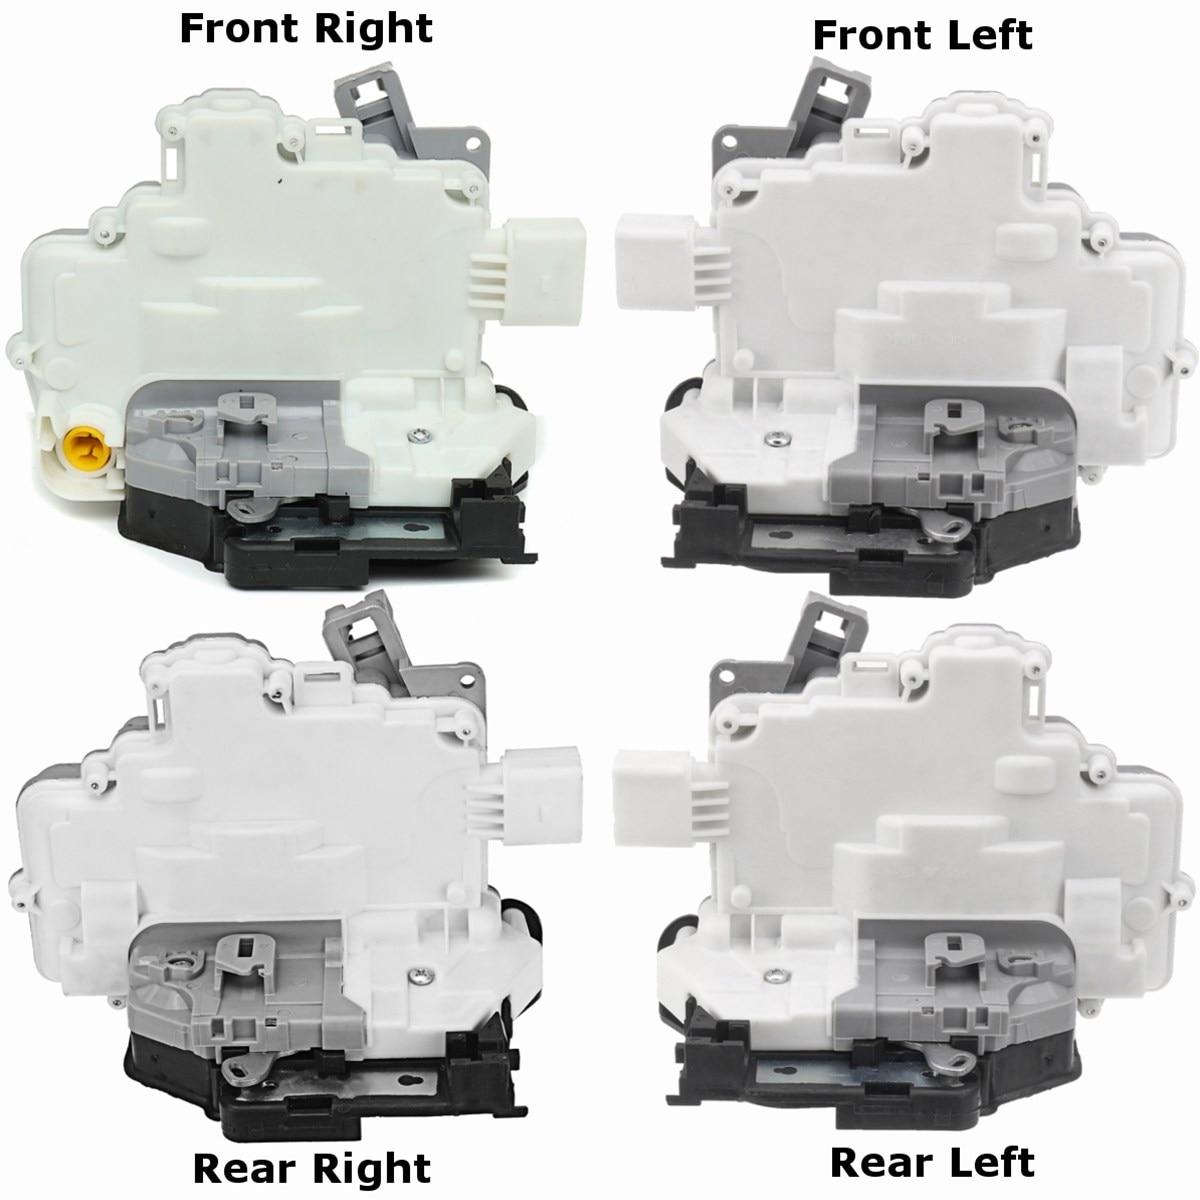 7 8 9 pin спереди и сзади справа налево Мощность Дверные замки Привод для Audi/VW A4 A5 Q3 Q5 q7 TT 2010 2011 2012 2013 2014 2015 2016 2017